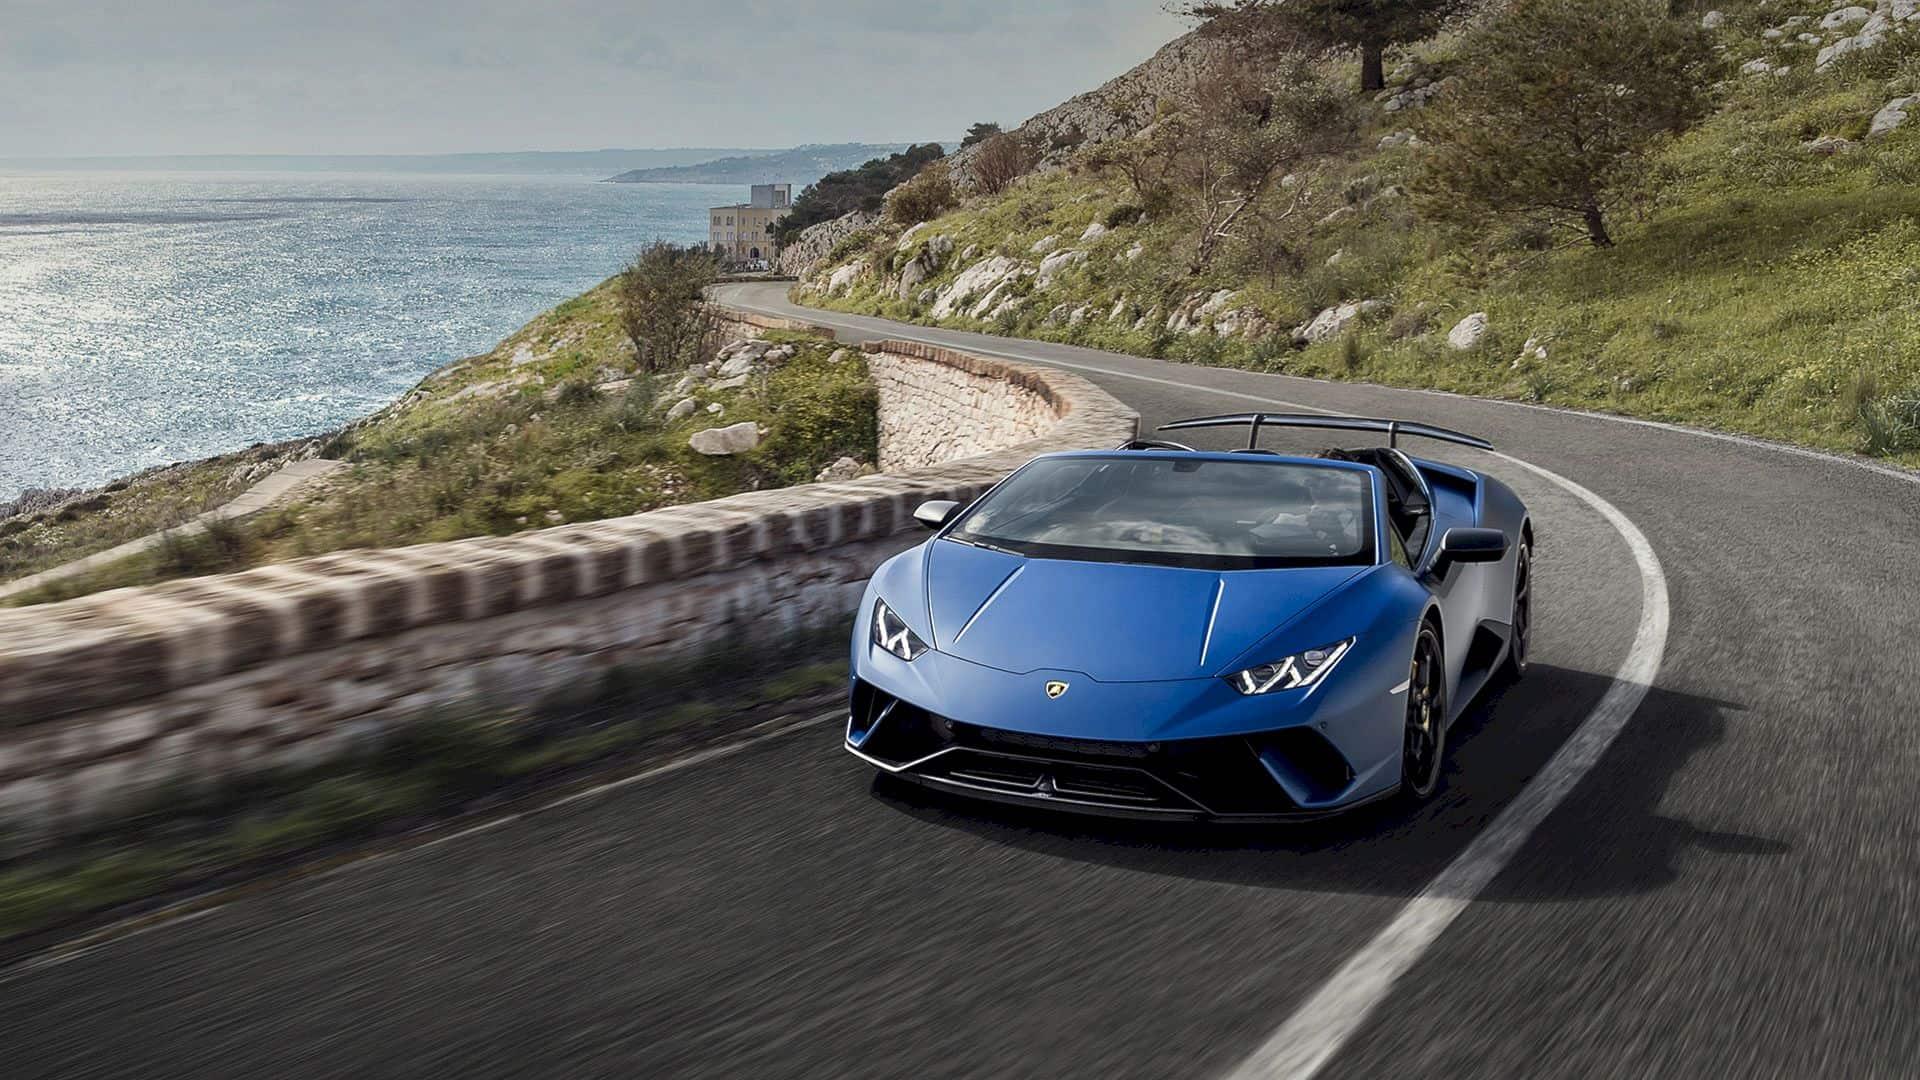 Lamborghini Huracan Performante 2